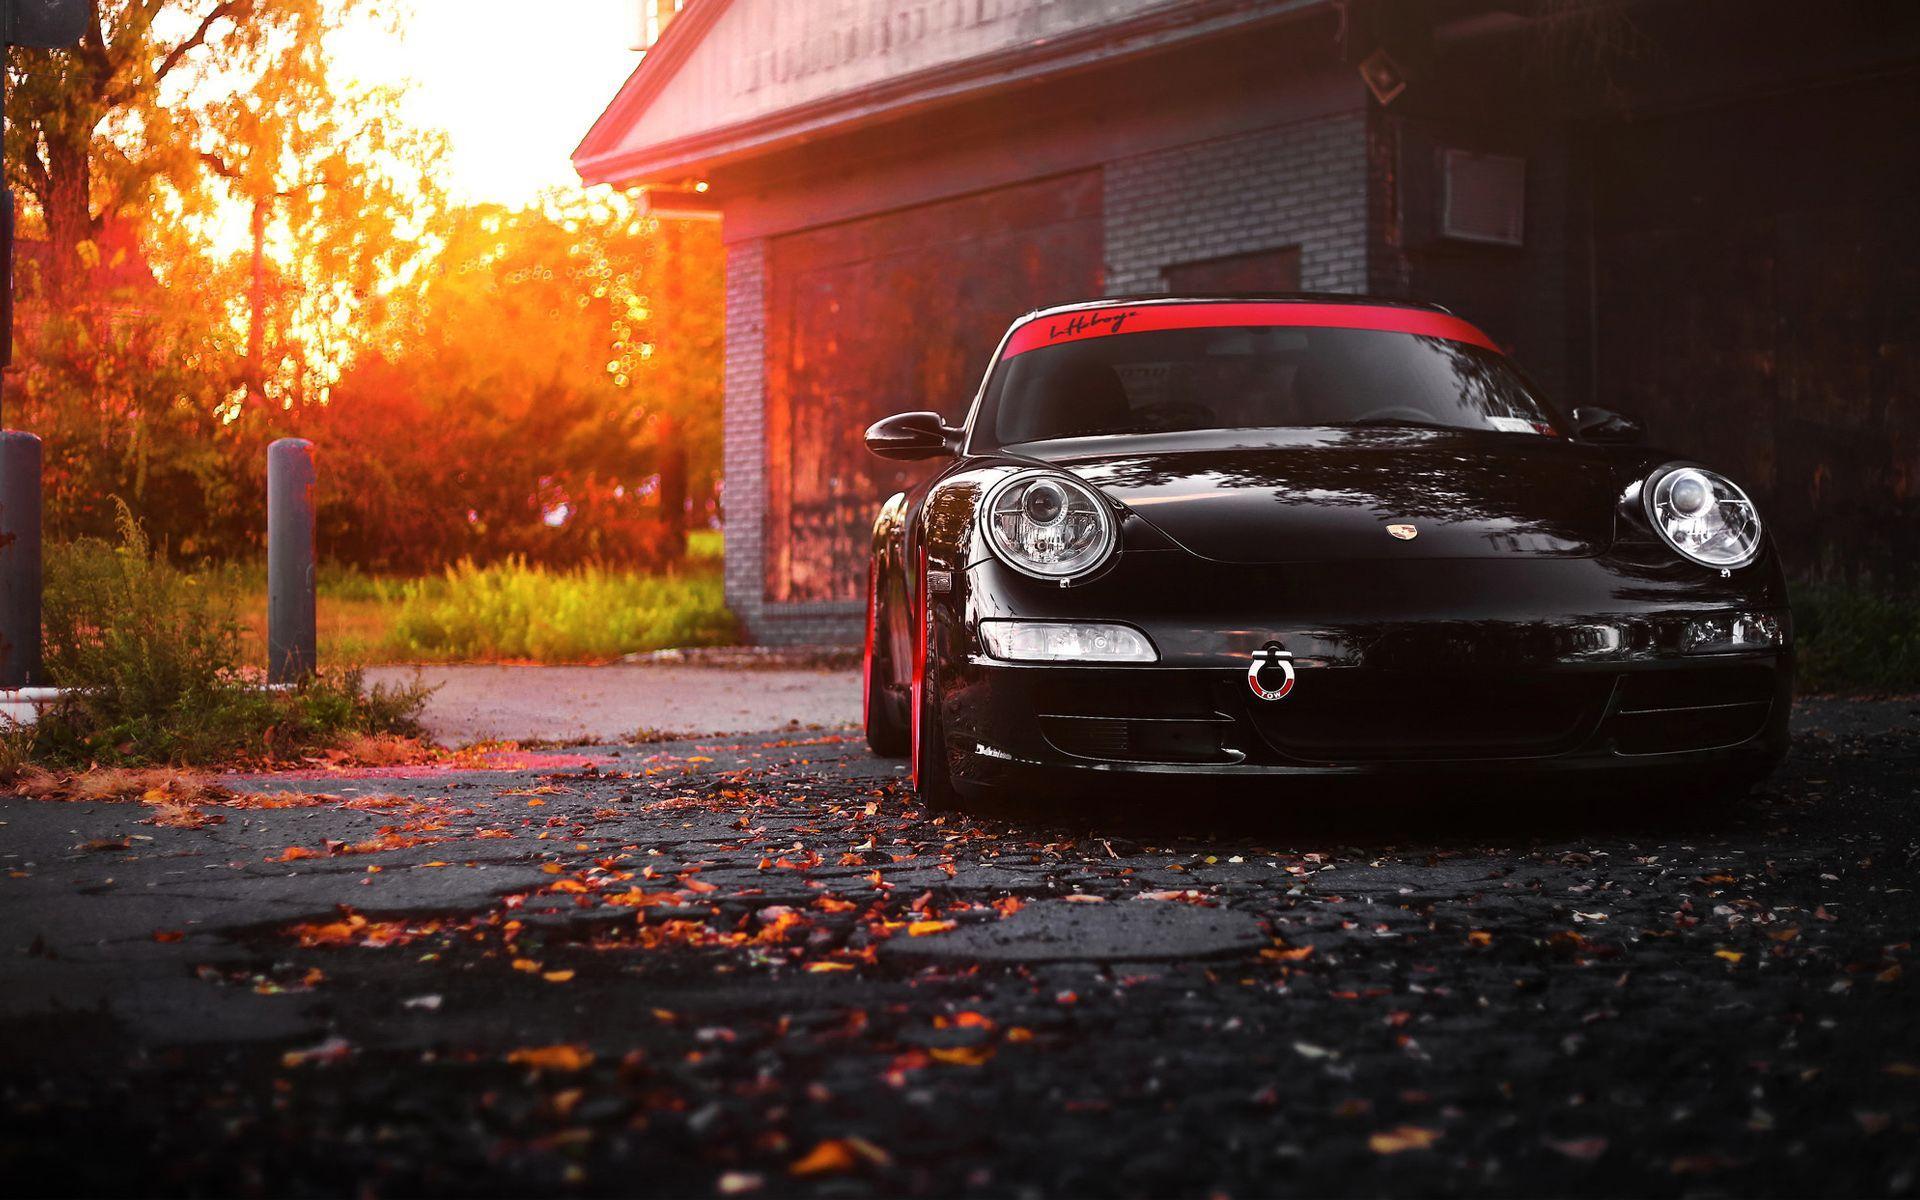 Black Porsche Wallpapers Top Free Black Porsche Backgrounds Wallpaperaccess